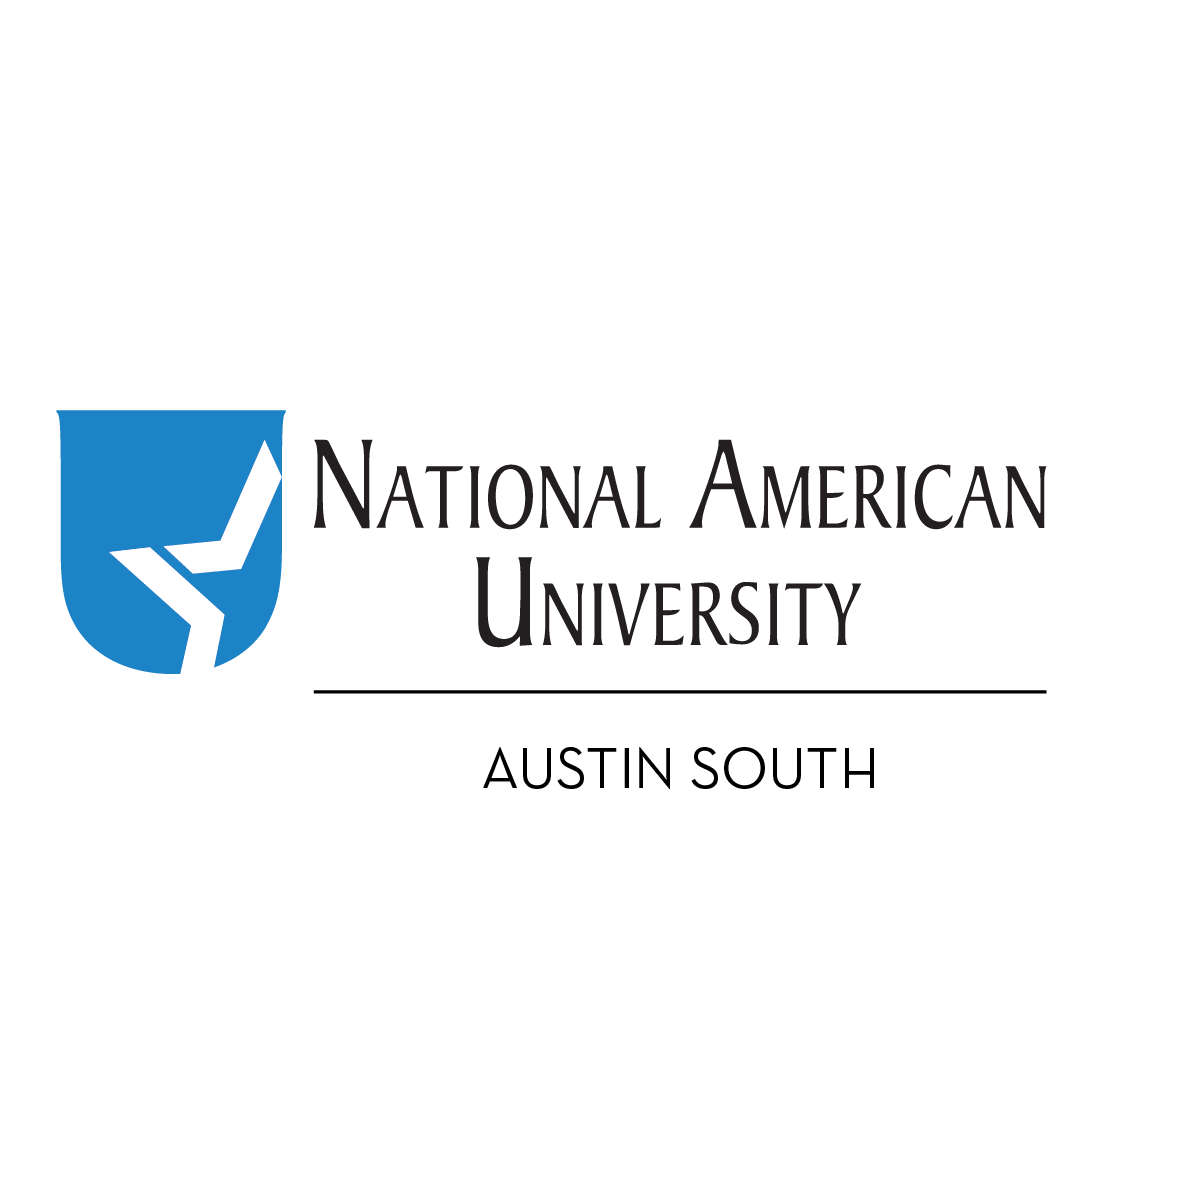 National American University Austin South